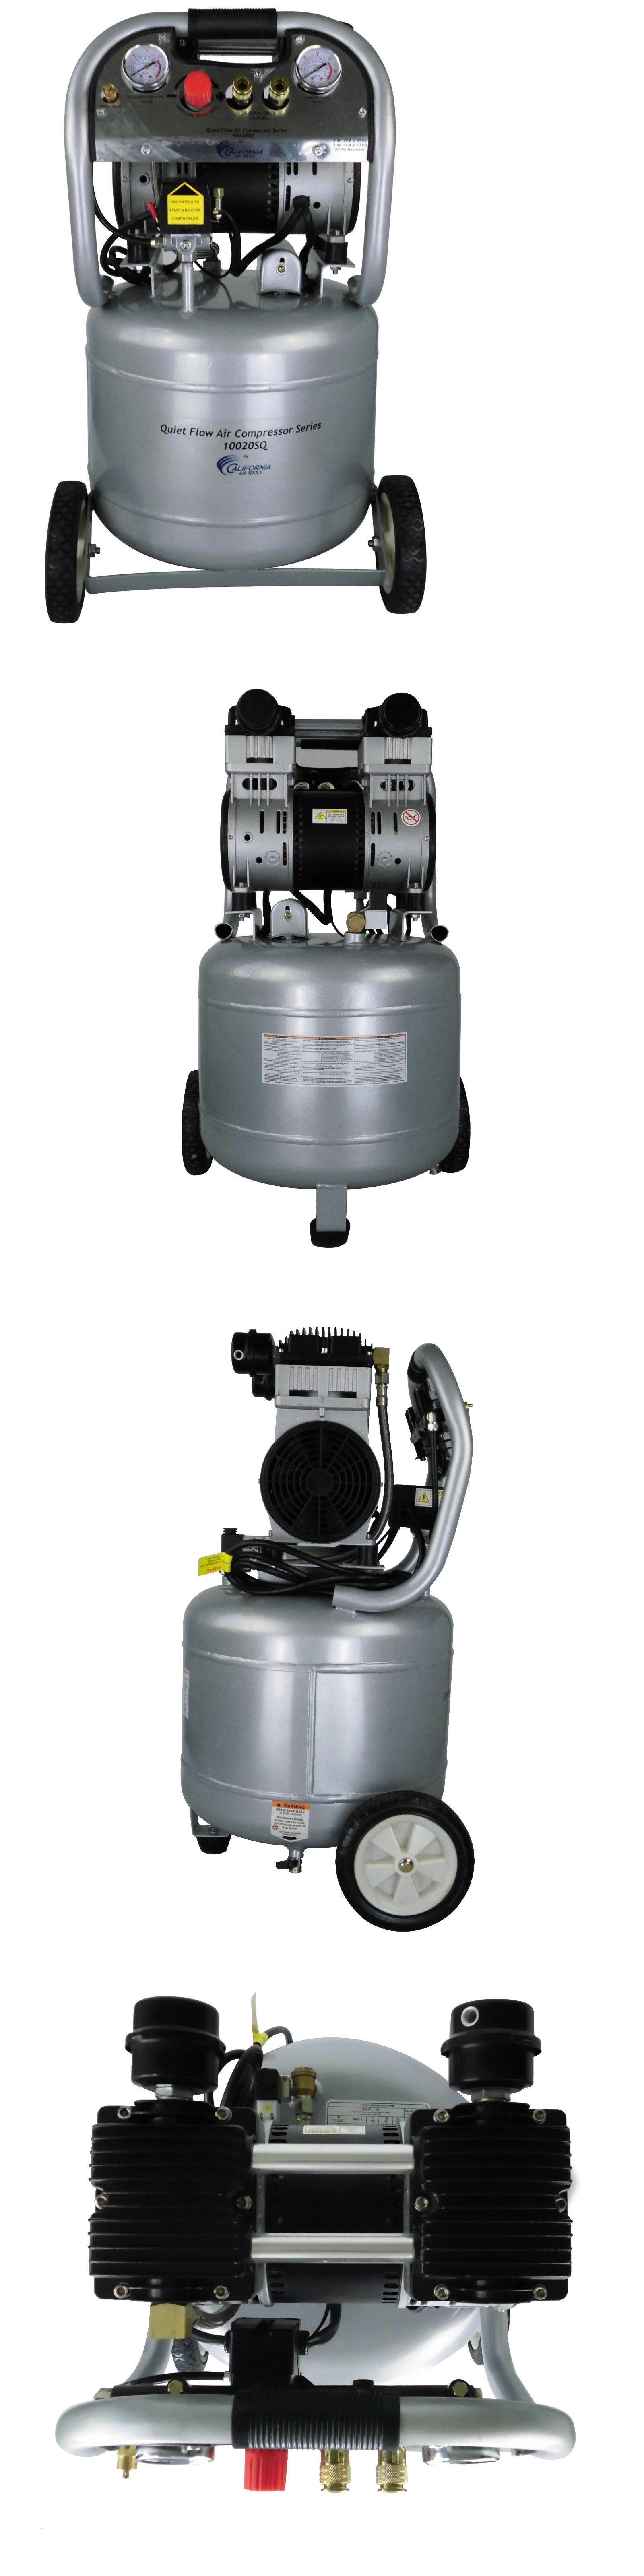 Air Compressors 30506 Quiet Flow 10020Sq By California